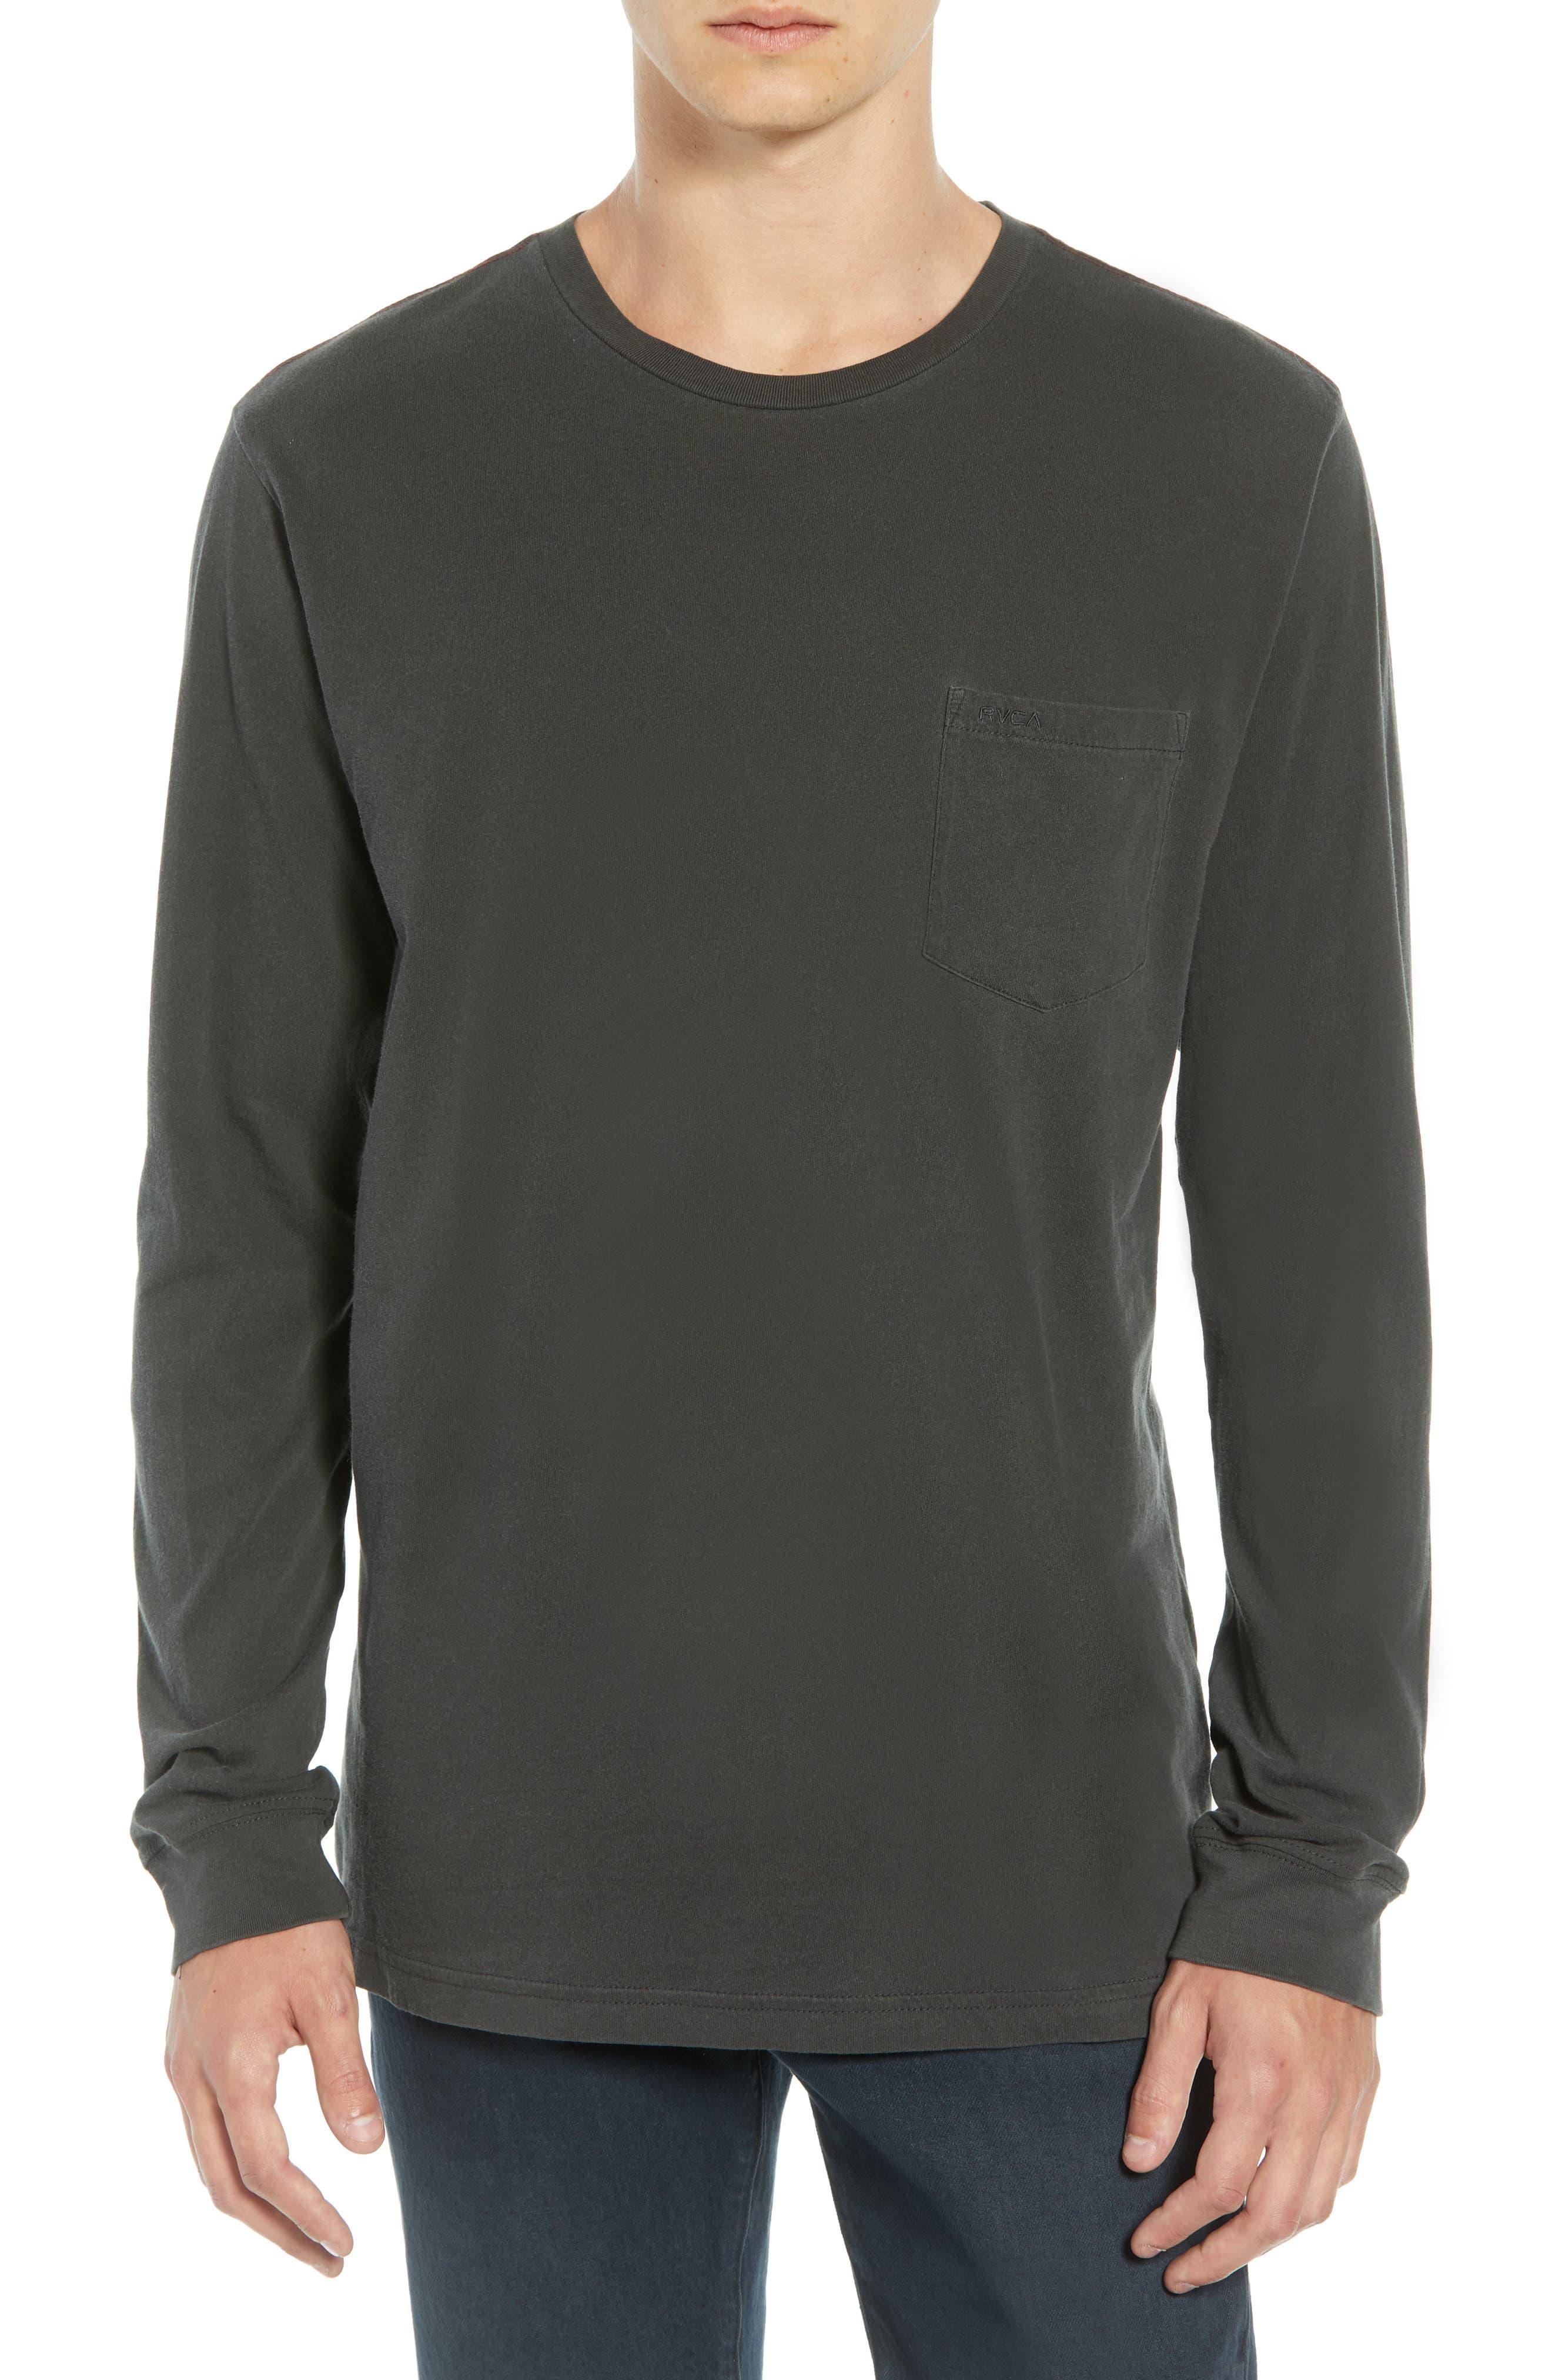 PTC Pigment Long Sleeve T-Shirt,                         Main,                         color, PIRATE BLACK